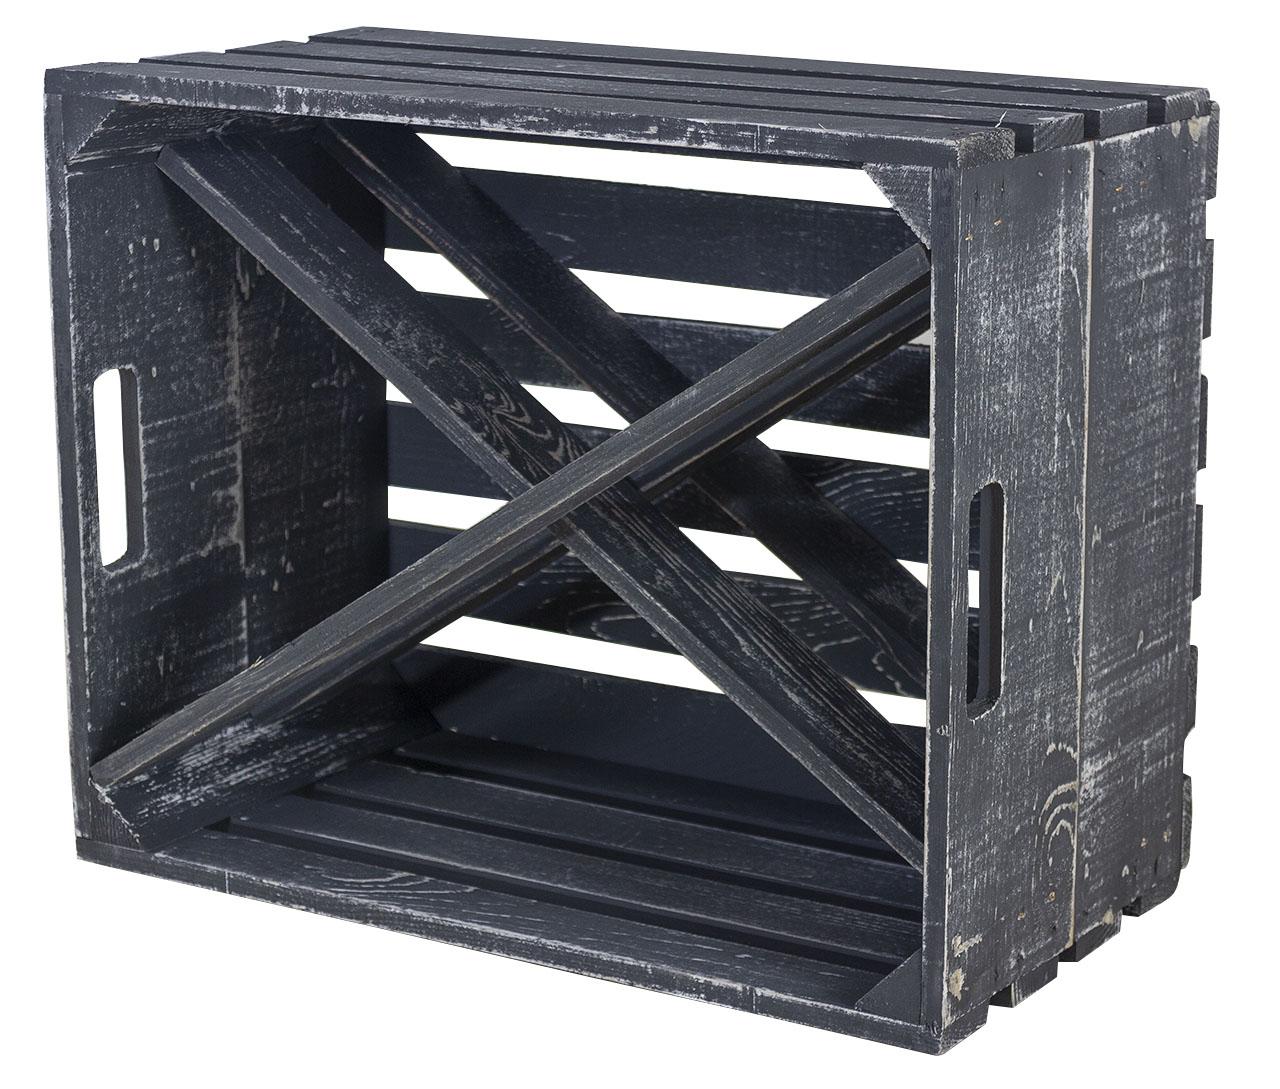 Shabby schwarze Kiste X als Flaschenregal 50x40x23cm